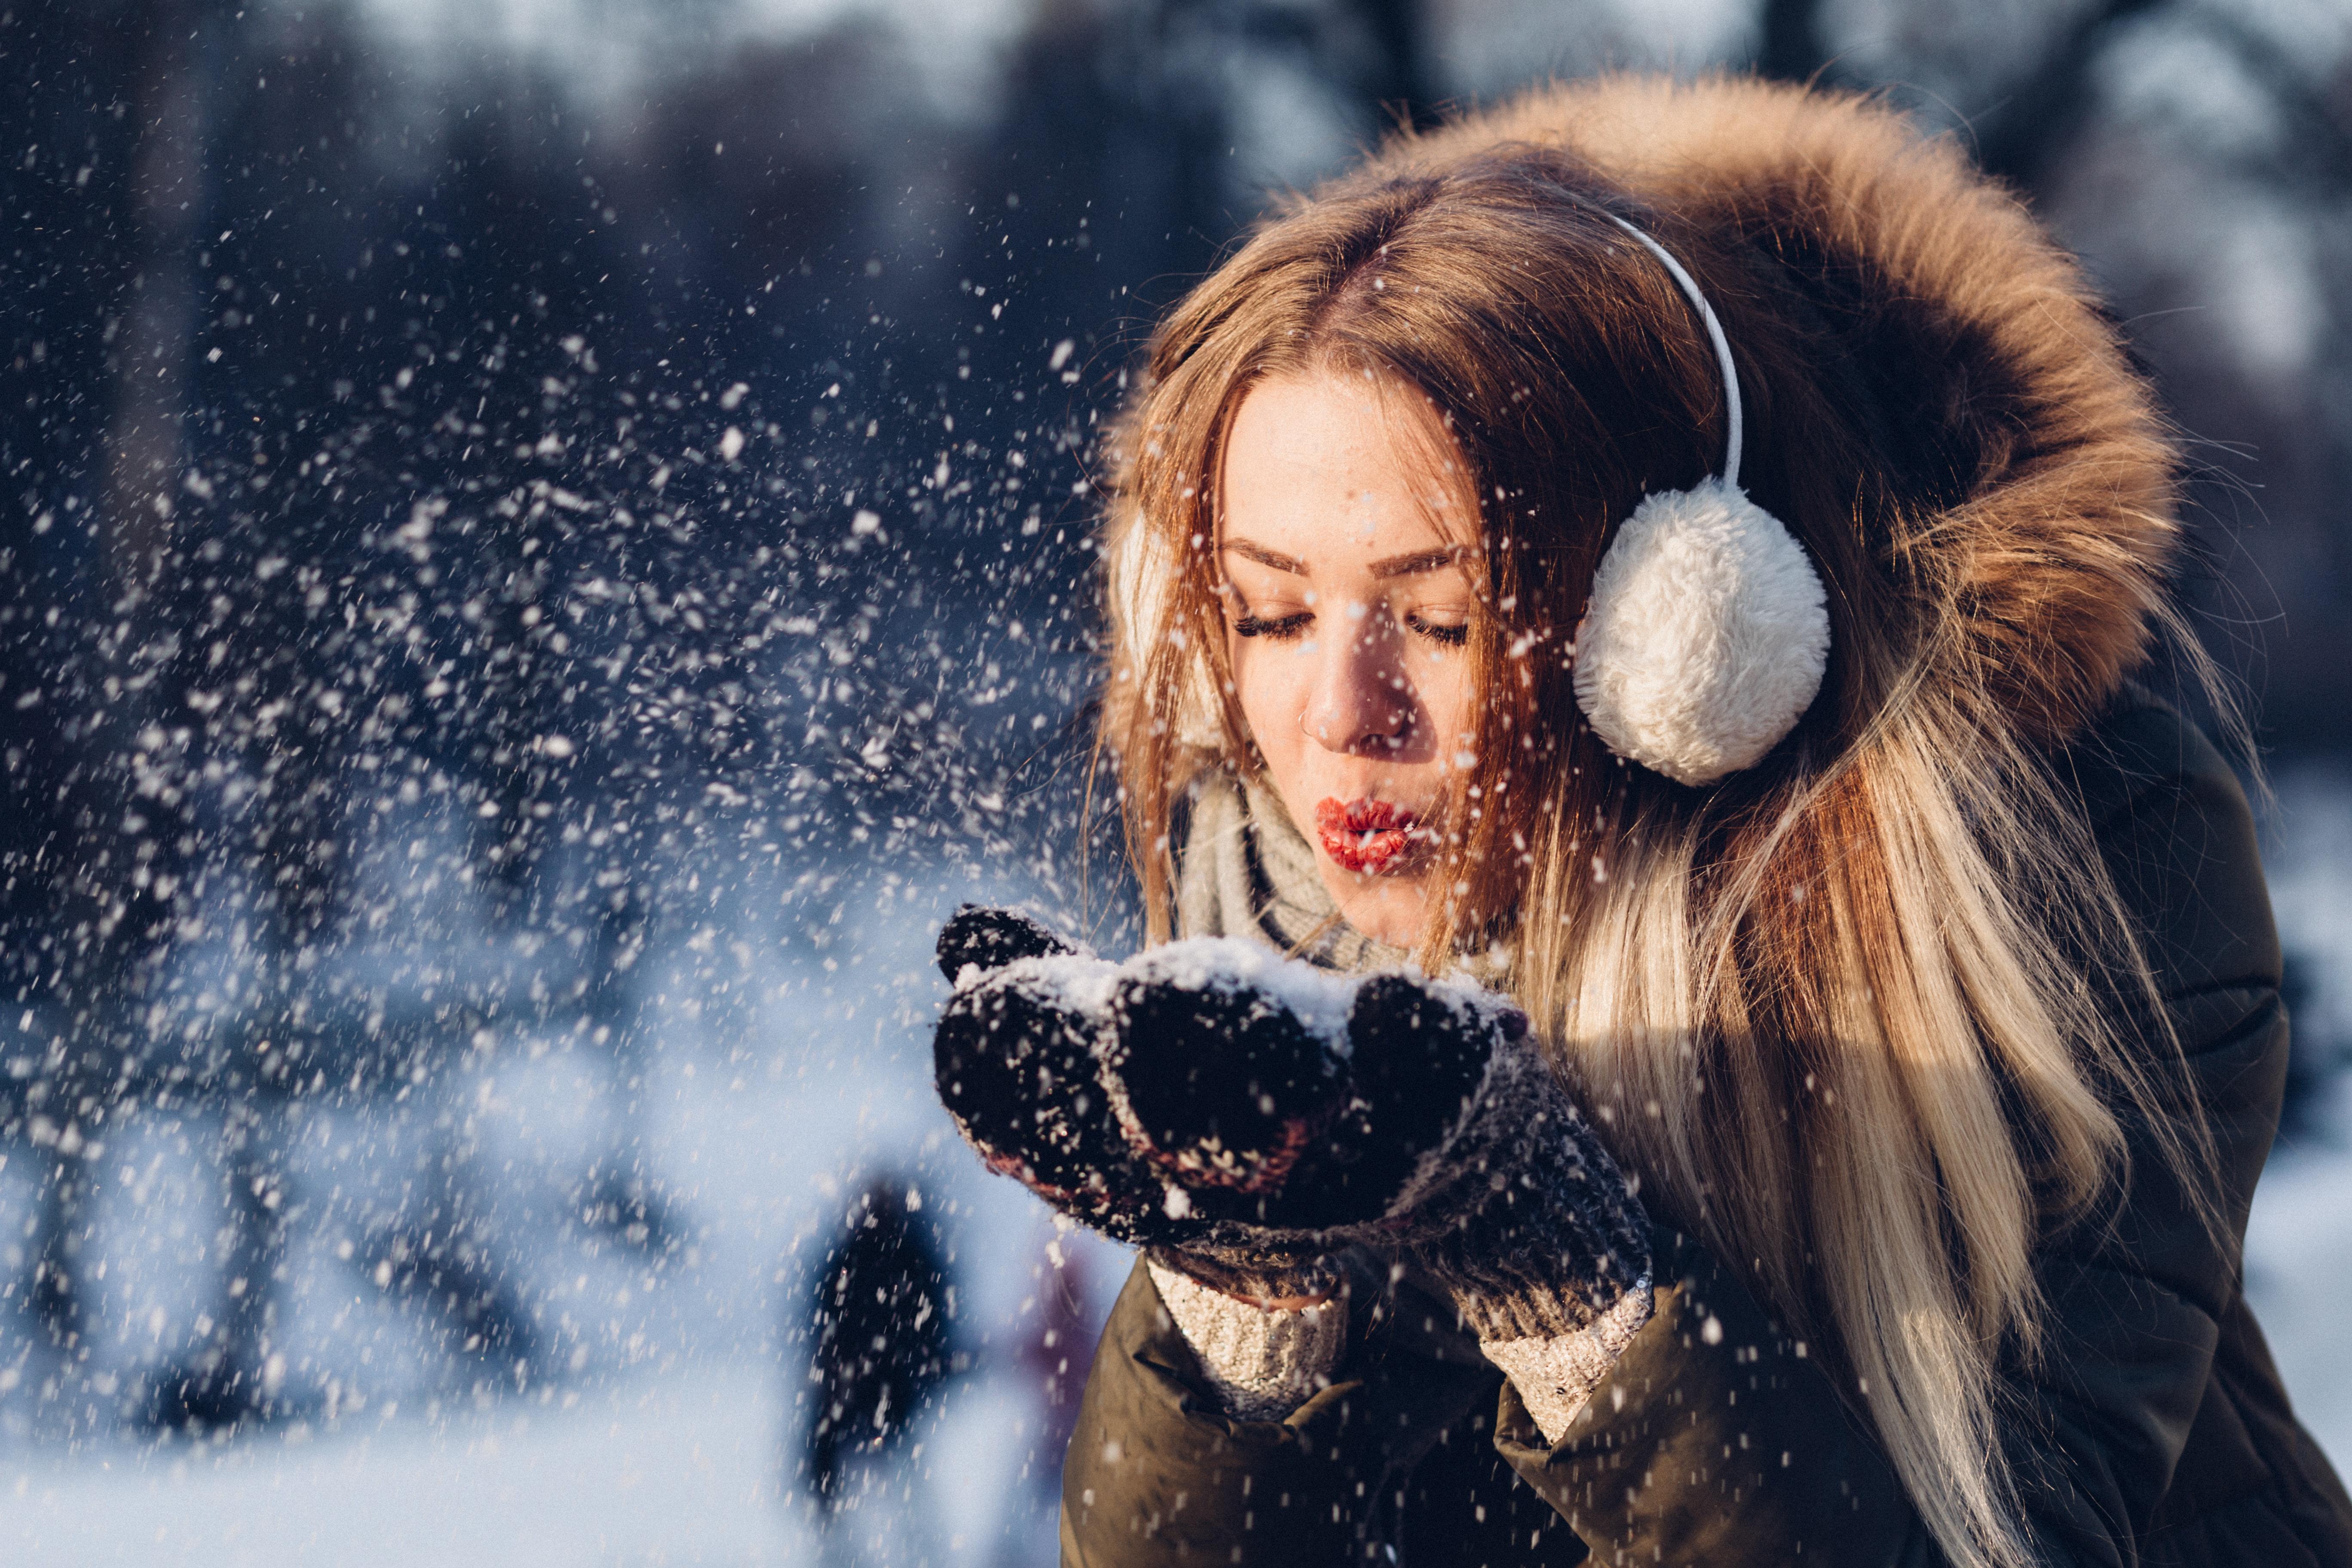 MÜNSTER_Wintermode_StockSnap_0SOS3Y098S